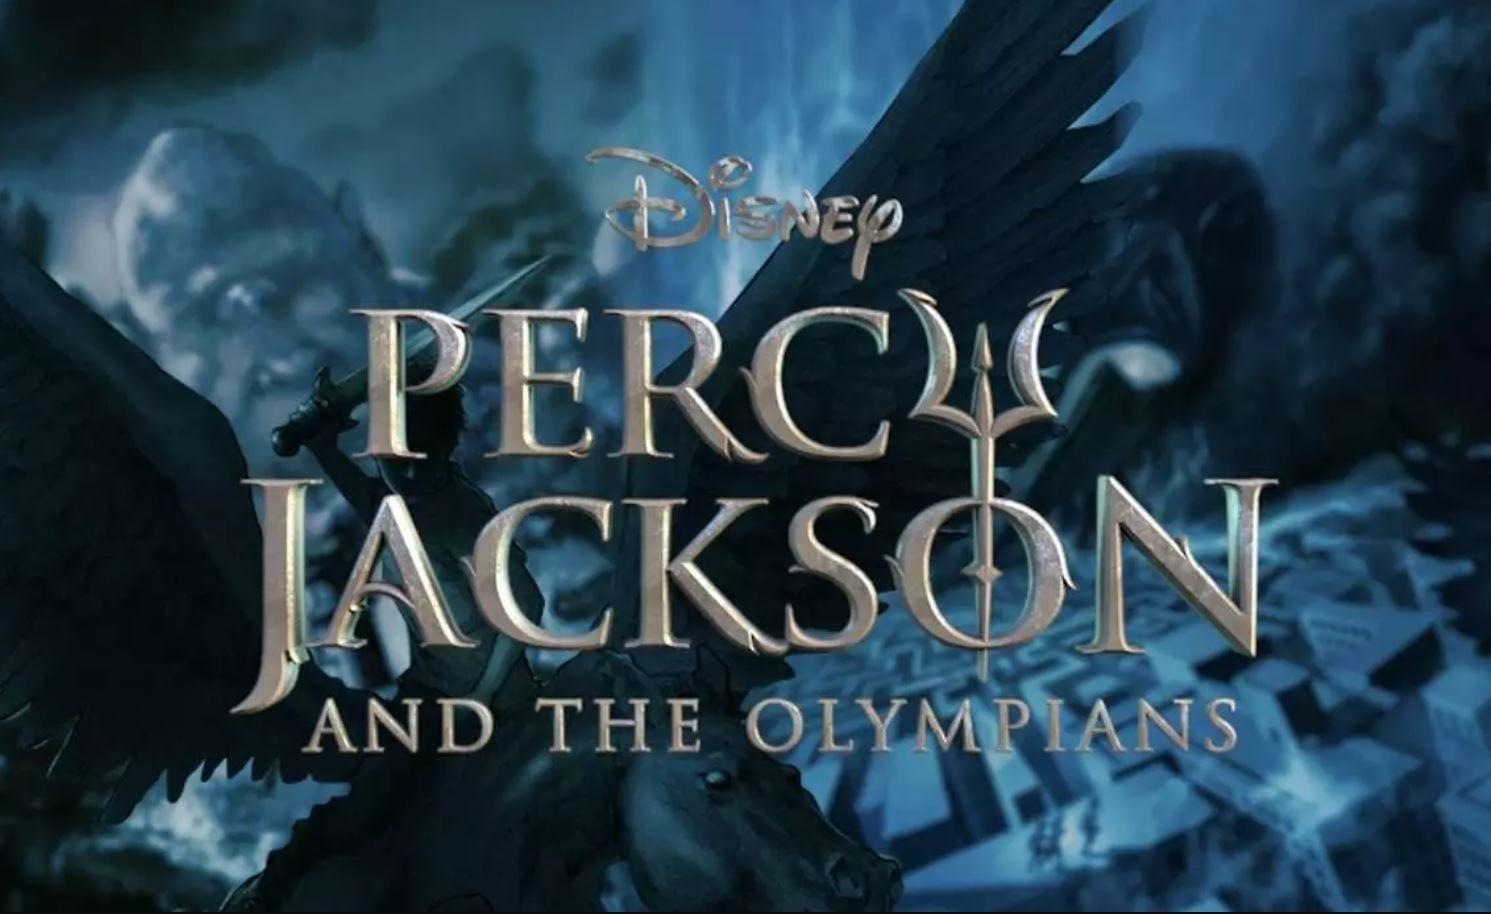 Percy Jackson Disney Plus TV Series: New Updates